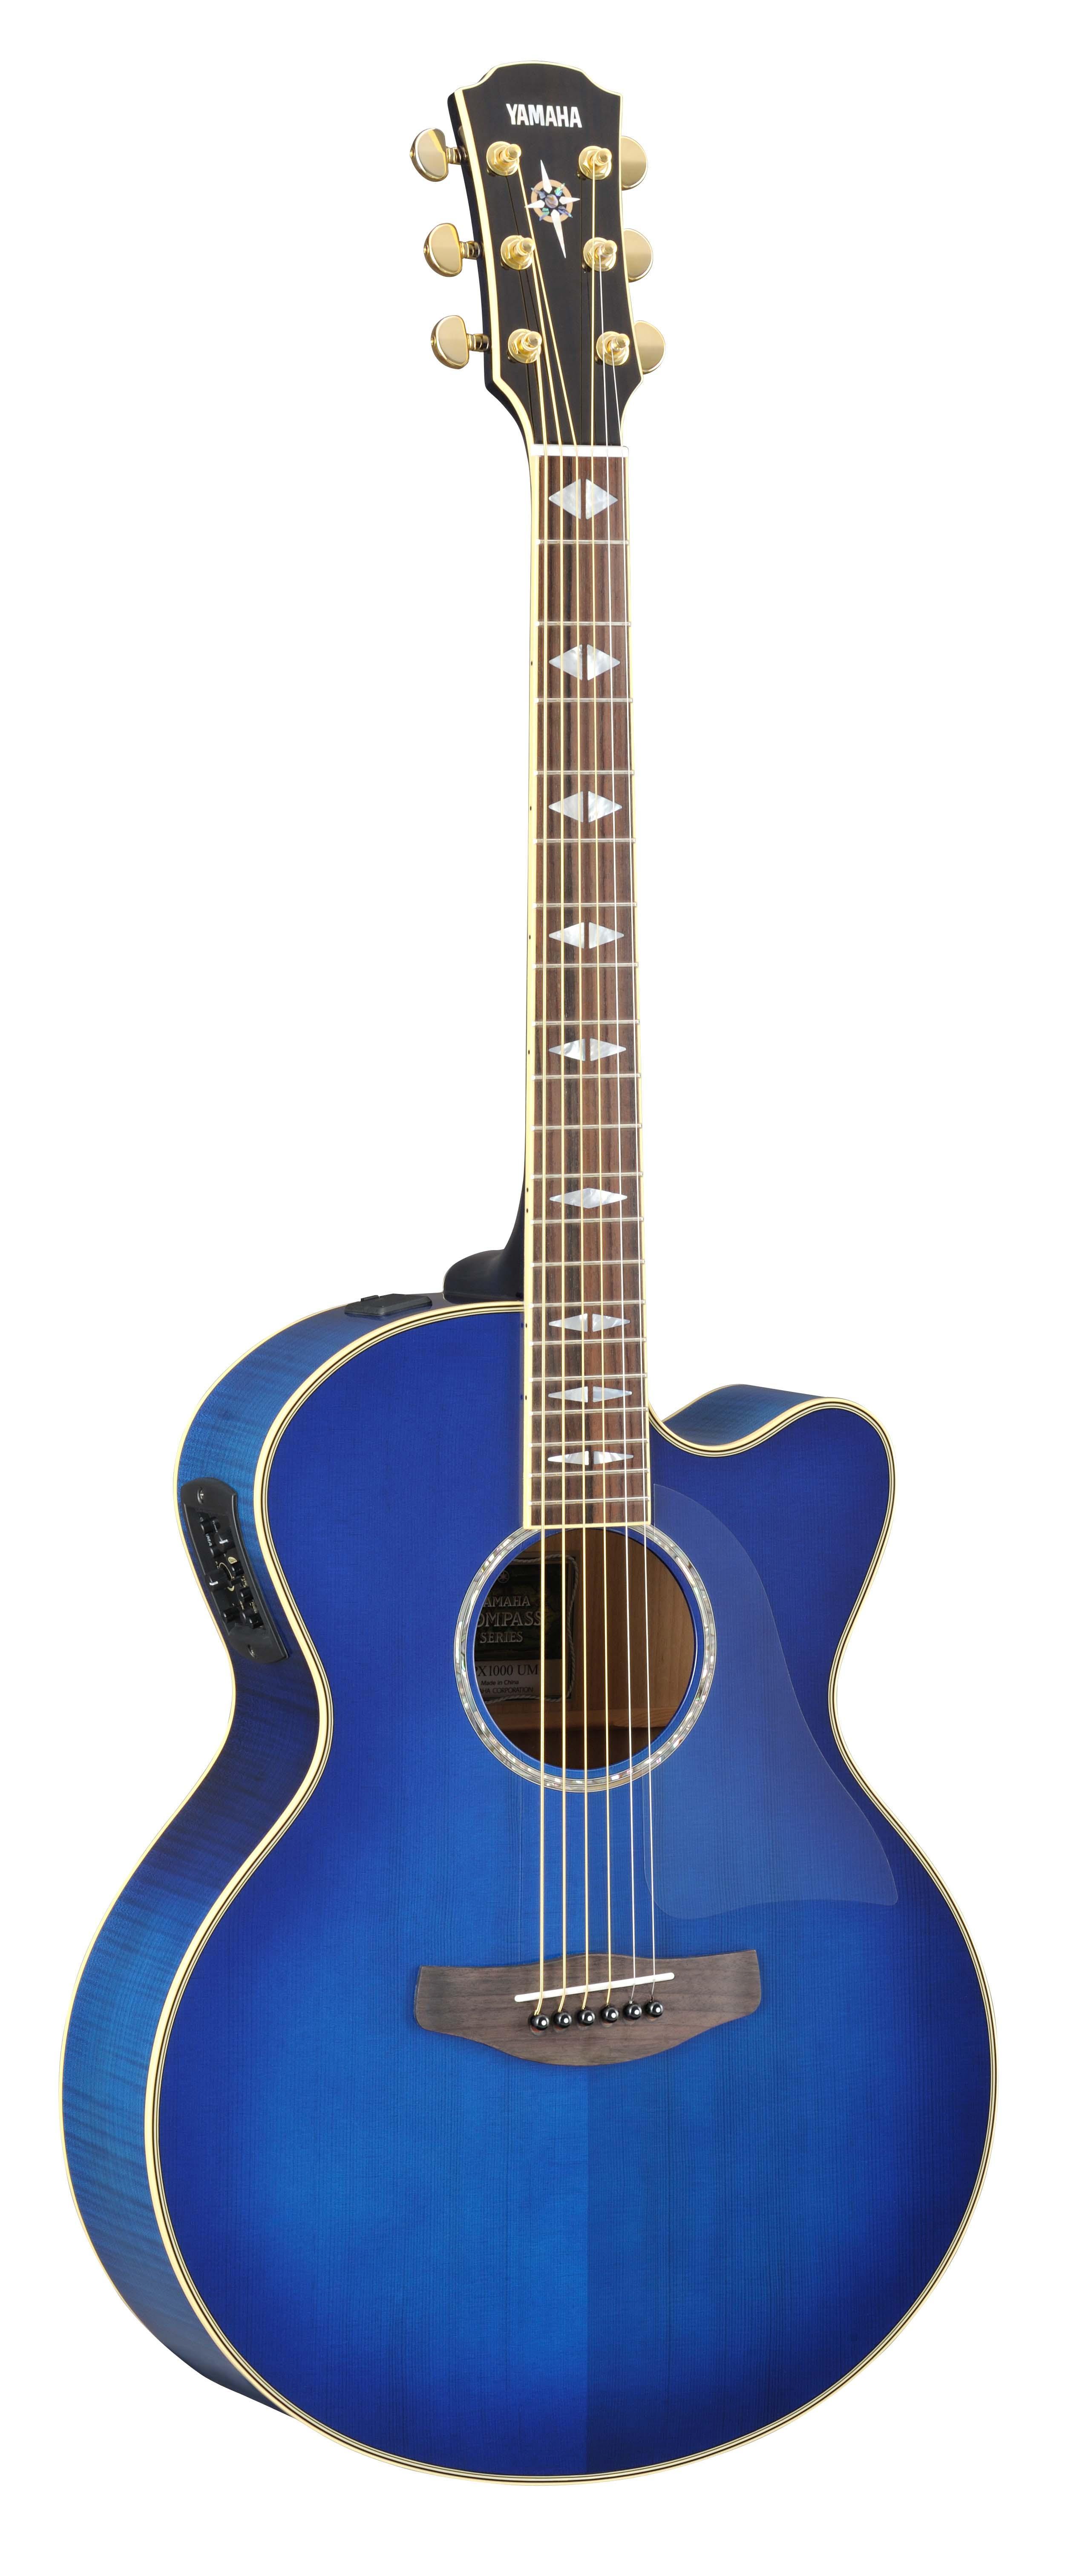 yamaha cpx1000 um medium jumbo cutaway acoustic electric guitar. Black Bedroom Furniture Sets. Home Design Ideas